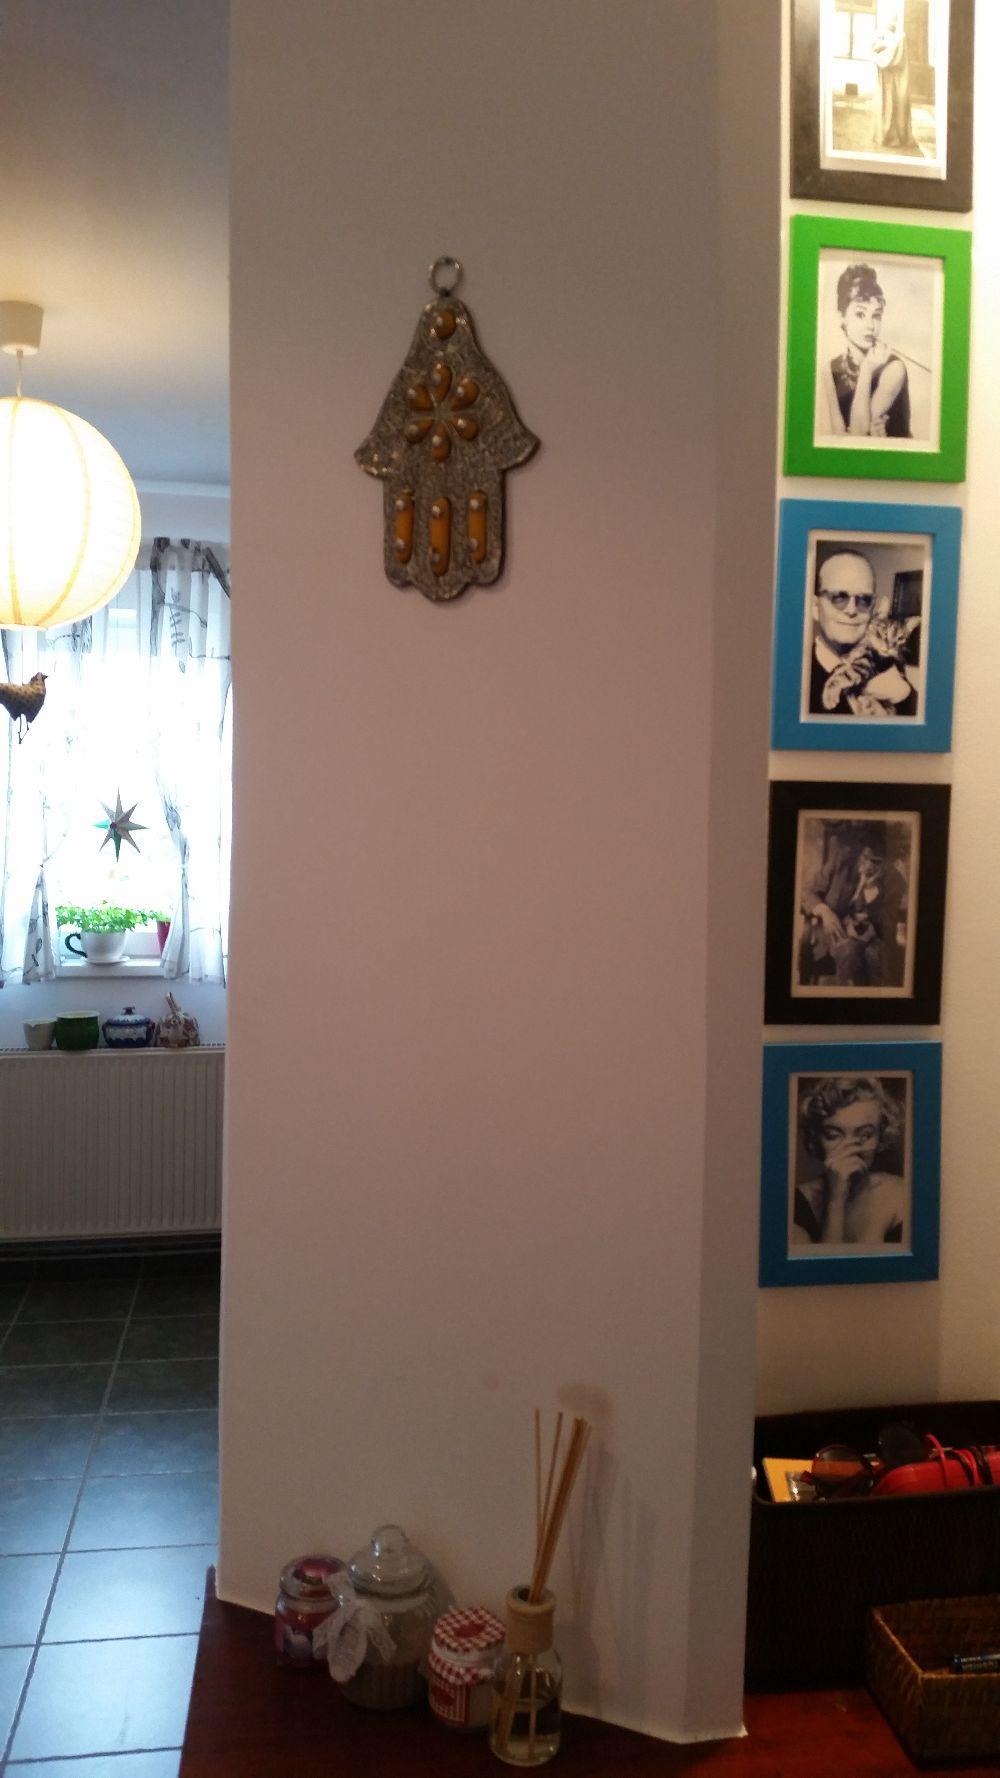 adelaparvu.com despre apartament 3 camere colorat in Sibiu, Foto Adela Parvu (33)